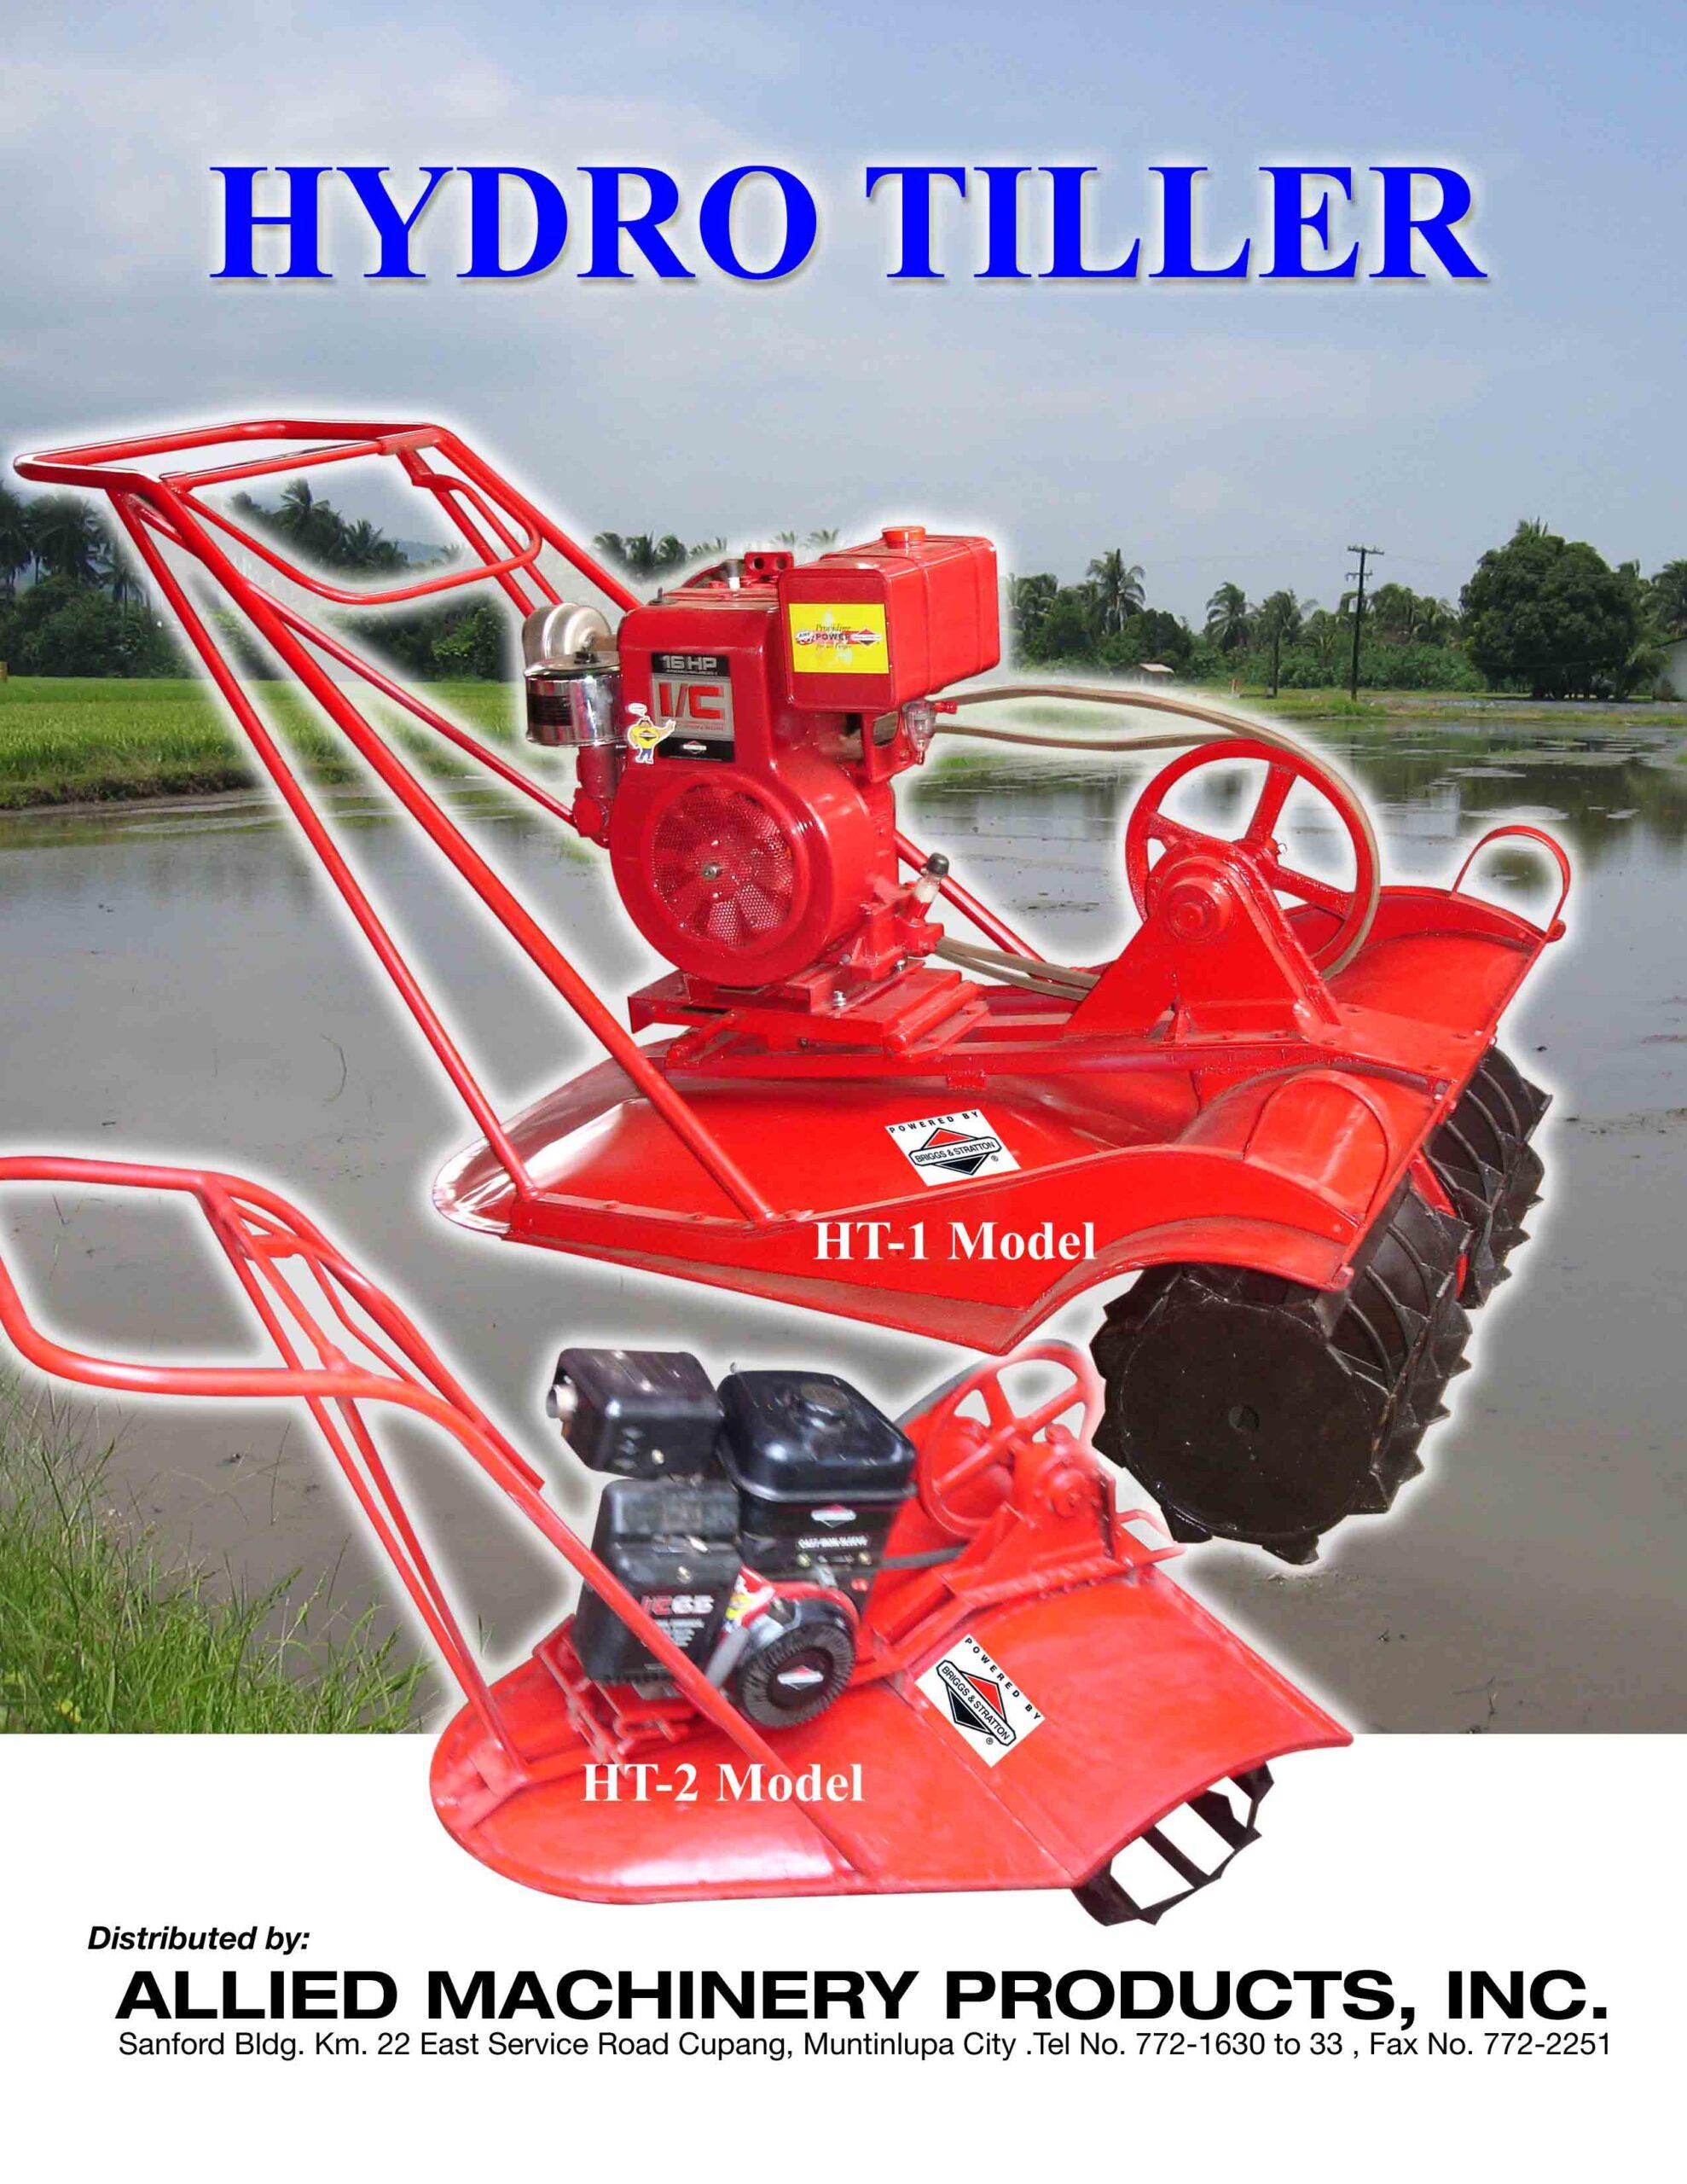 Hydro Tiller